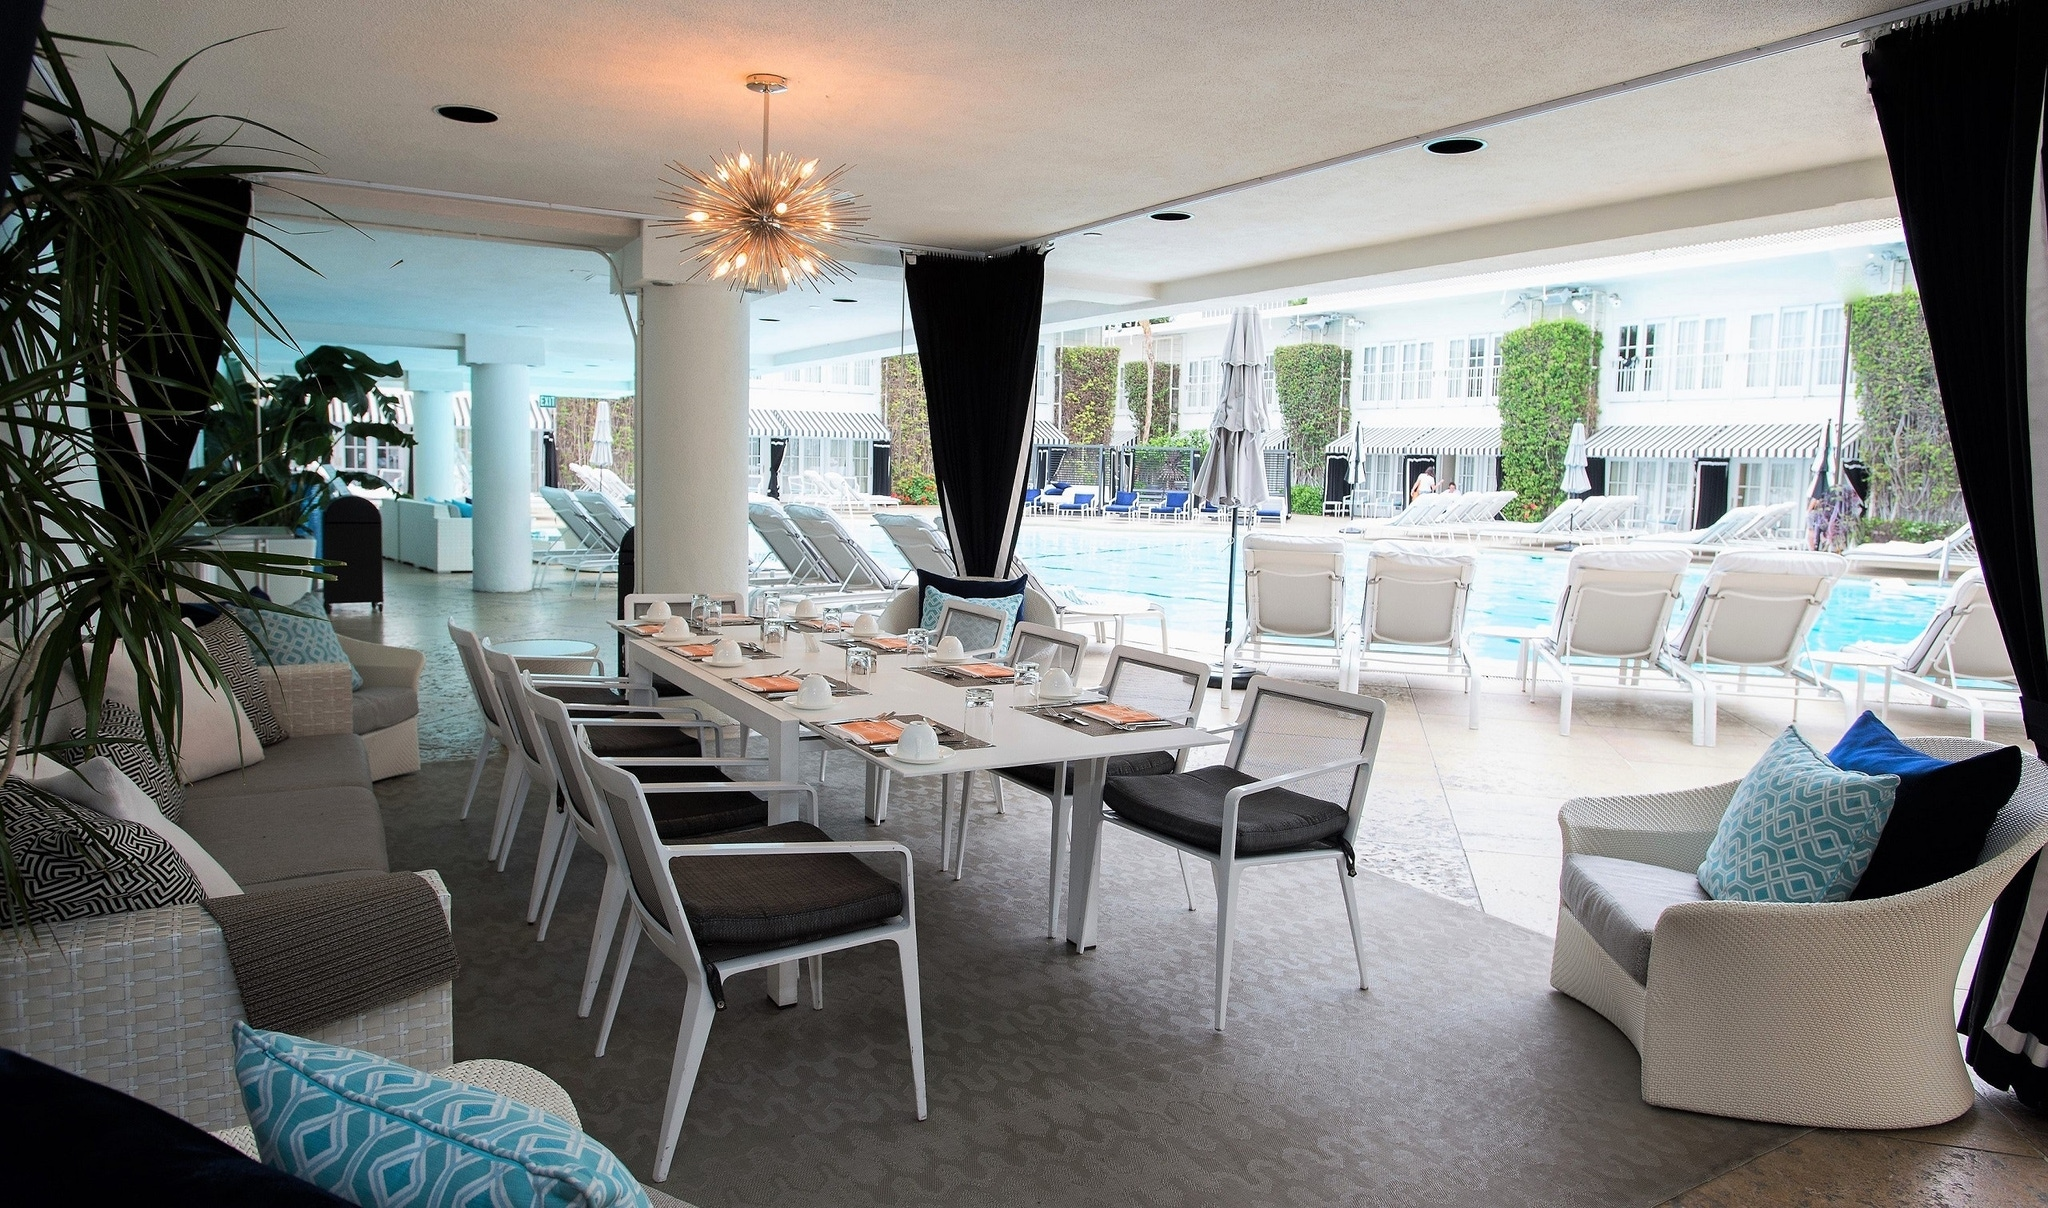 Circa 55, The Beverly Hilton